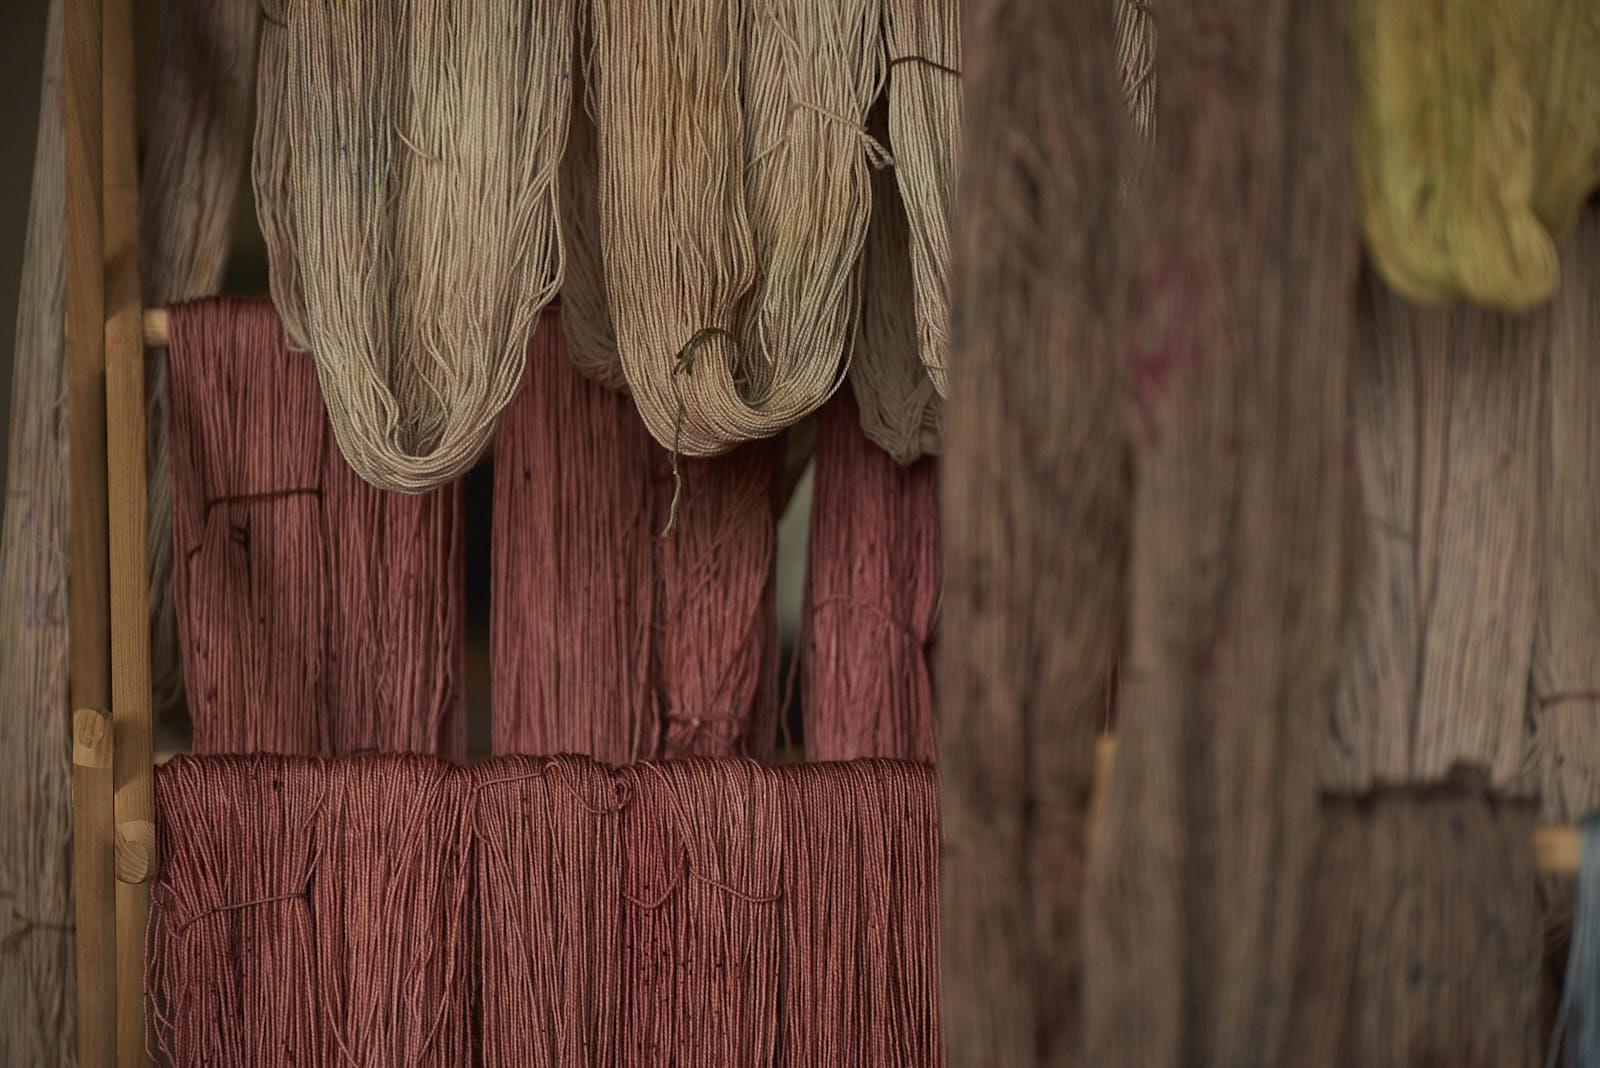 drying 4.jpg